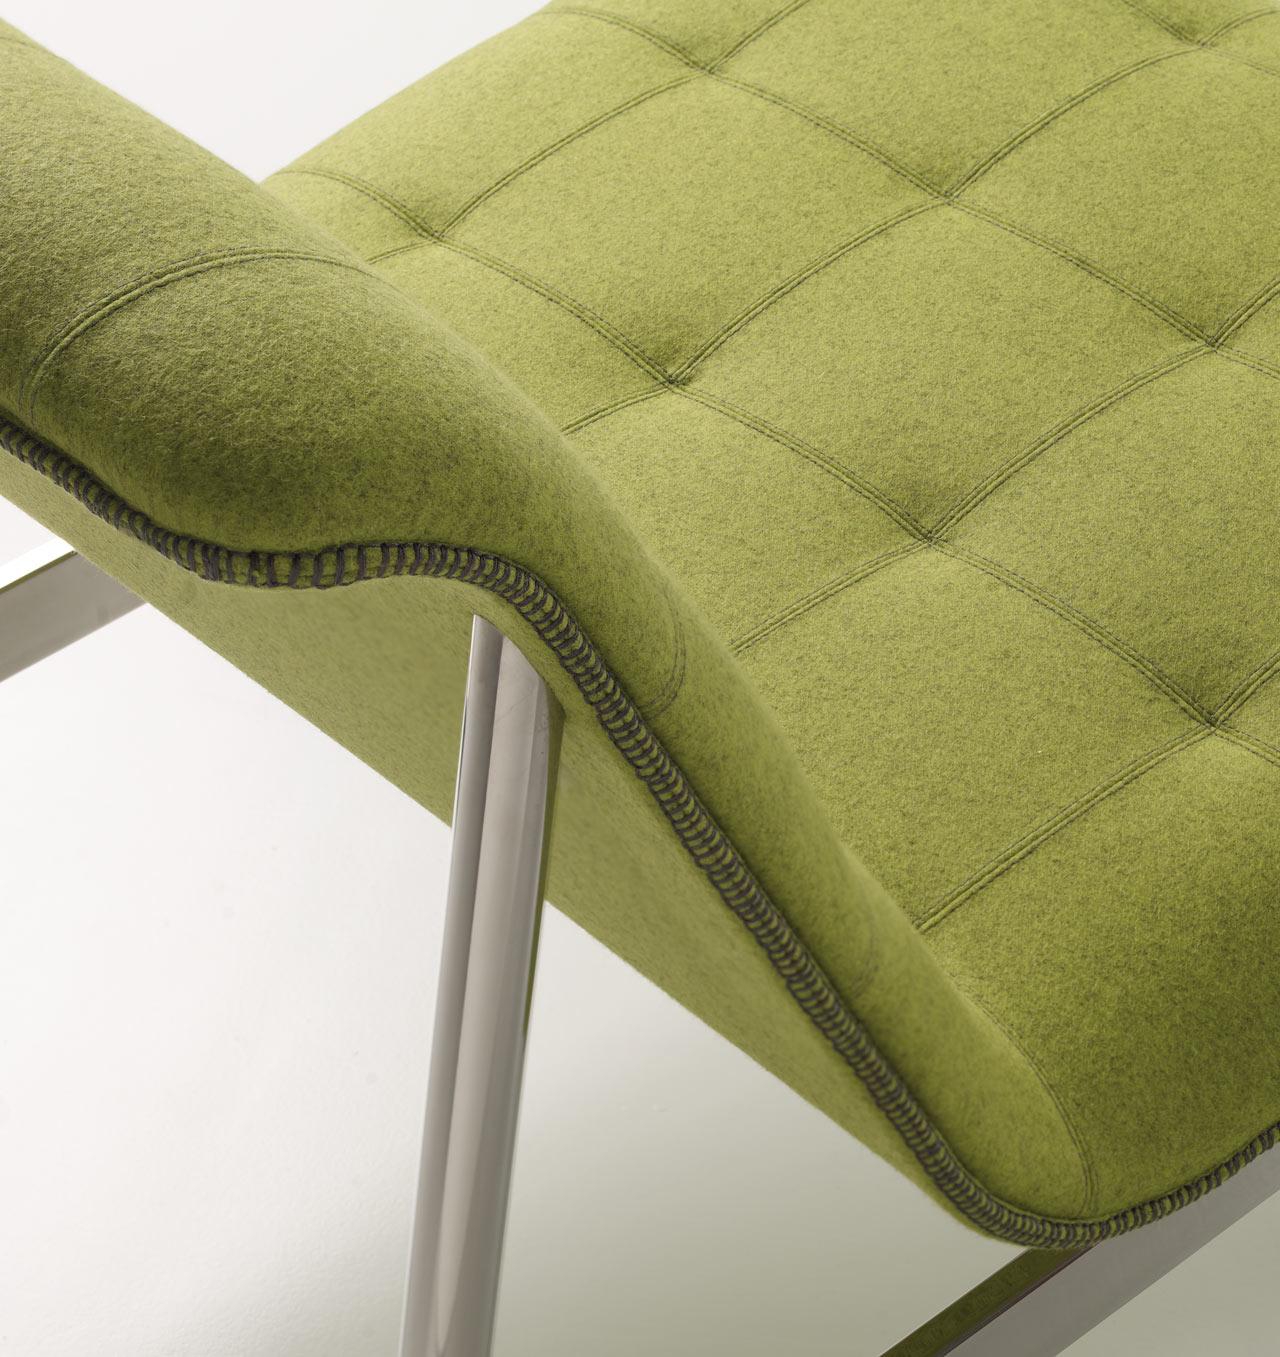 cp-lounge-chair-pollock-bernhardt-felt